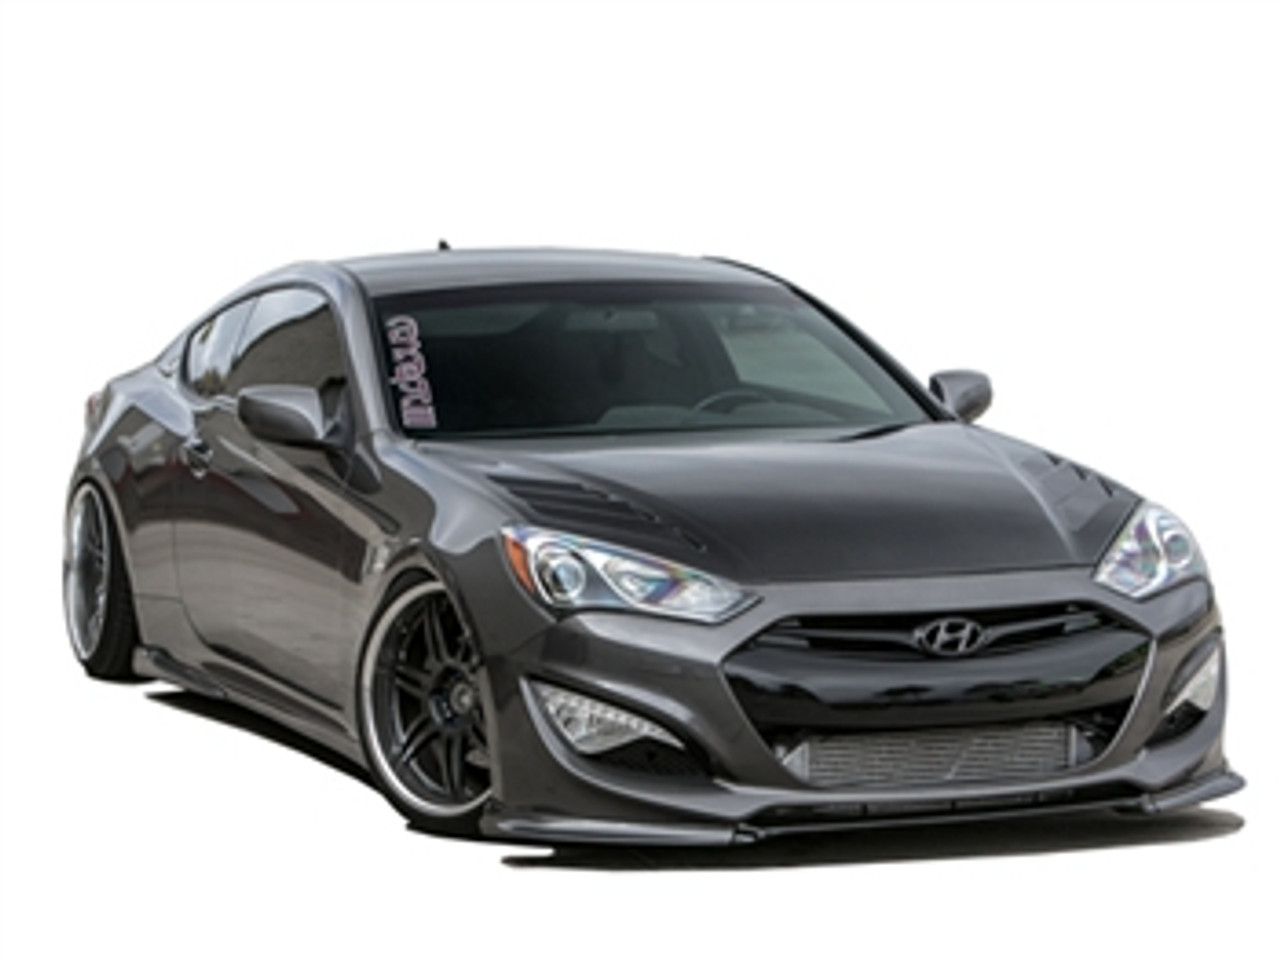 hight resolution of rksport carbon fiber vented hood for hyundai genesis coupe 2013 2016